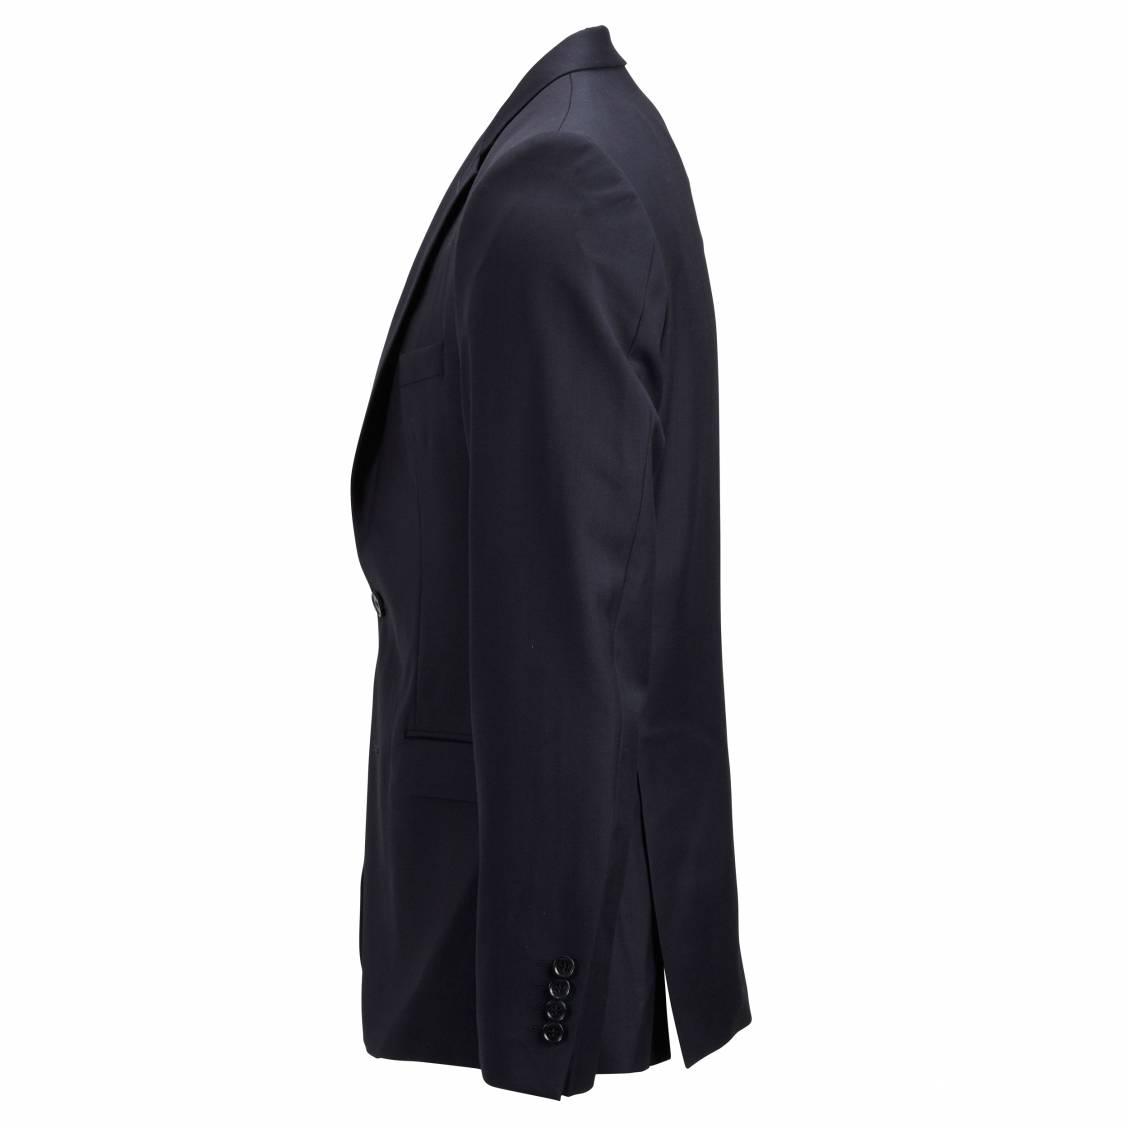 Blazer homme selected en laine Bleu marine